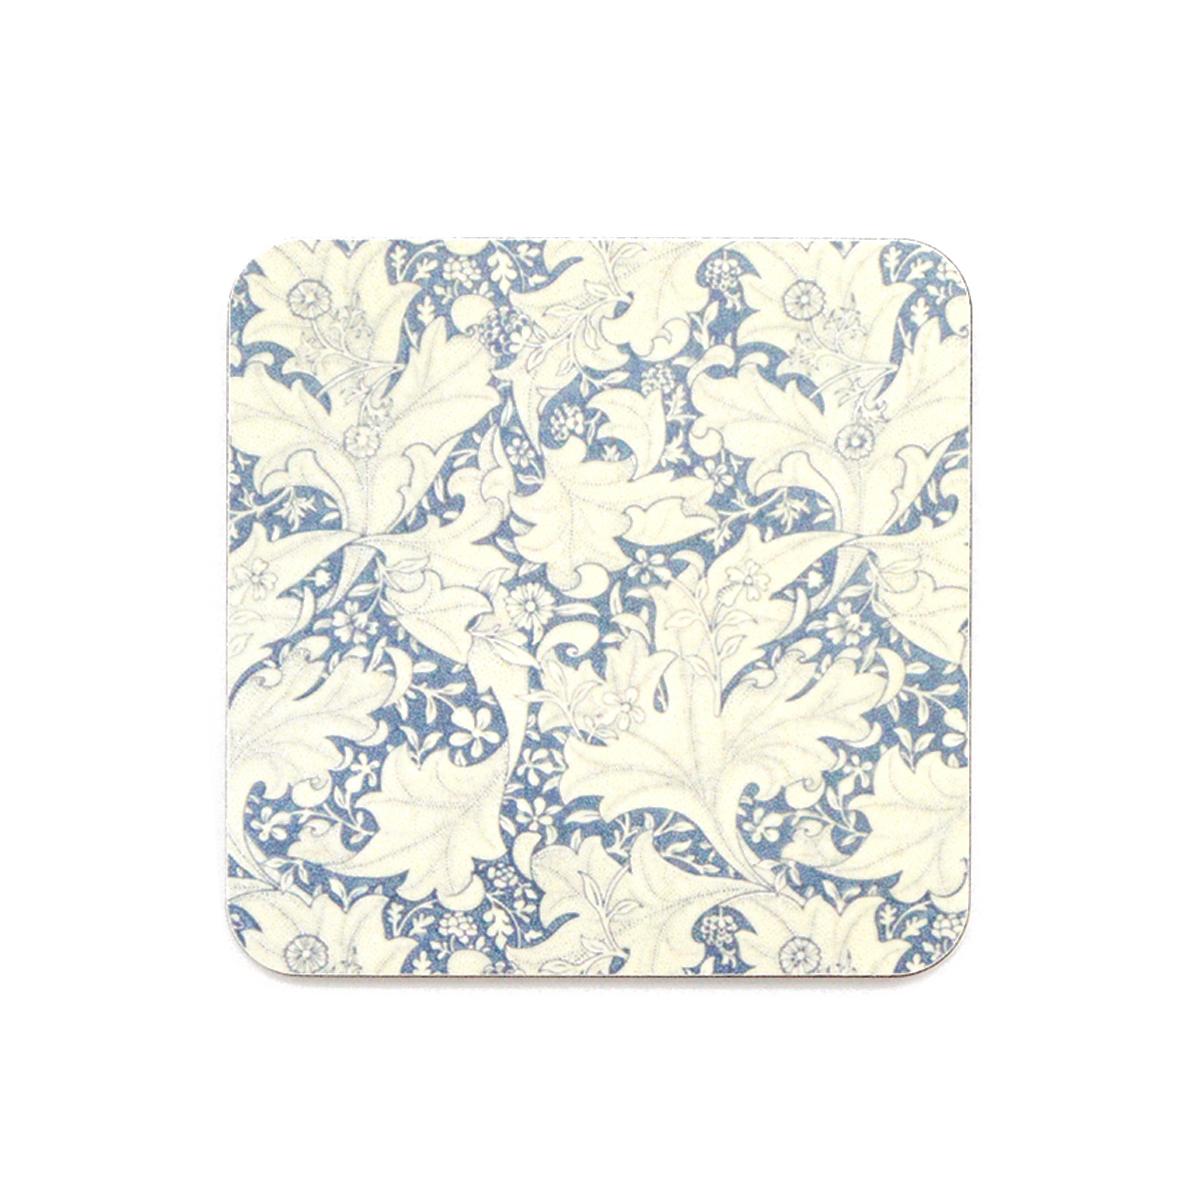 William Morris Wallflower coaster